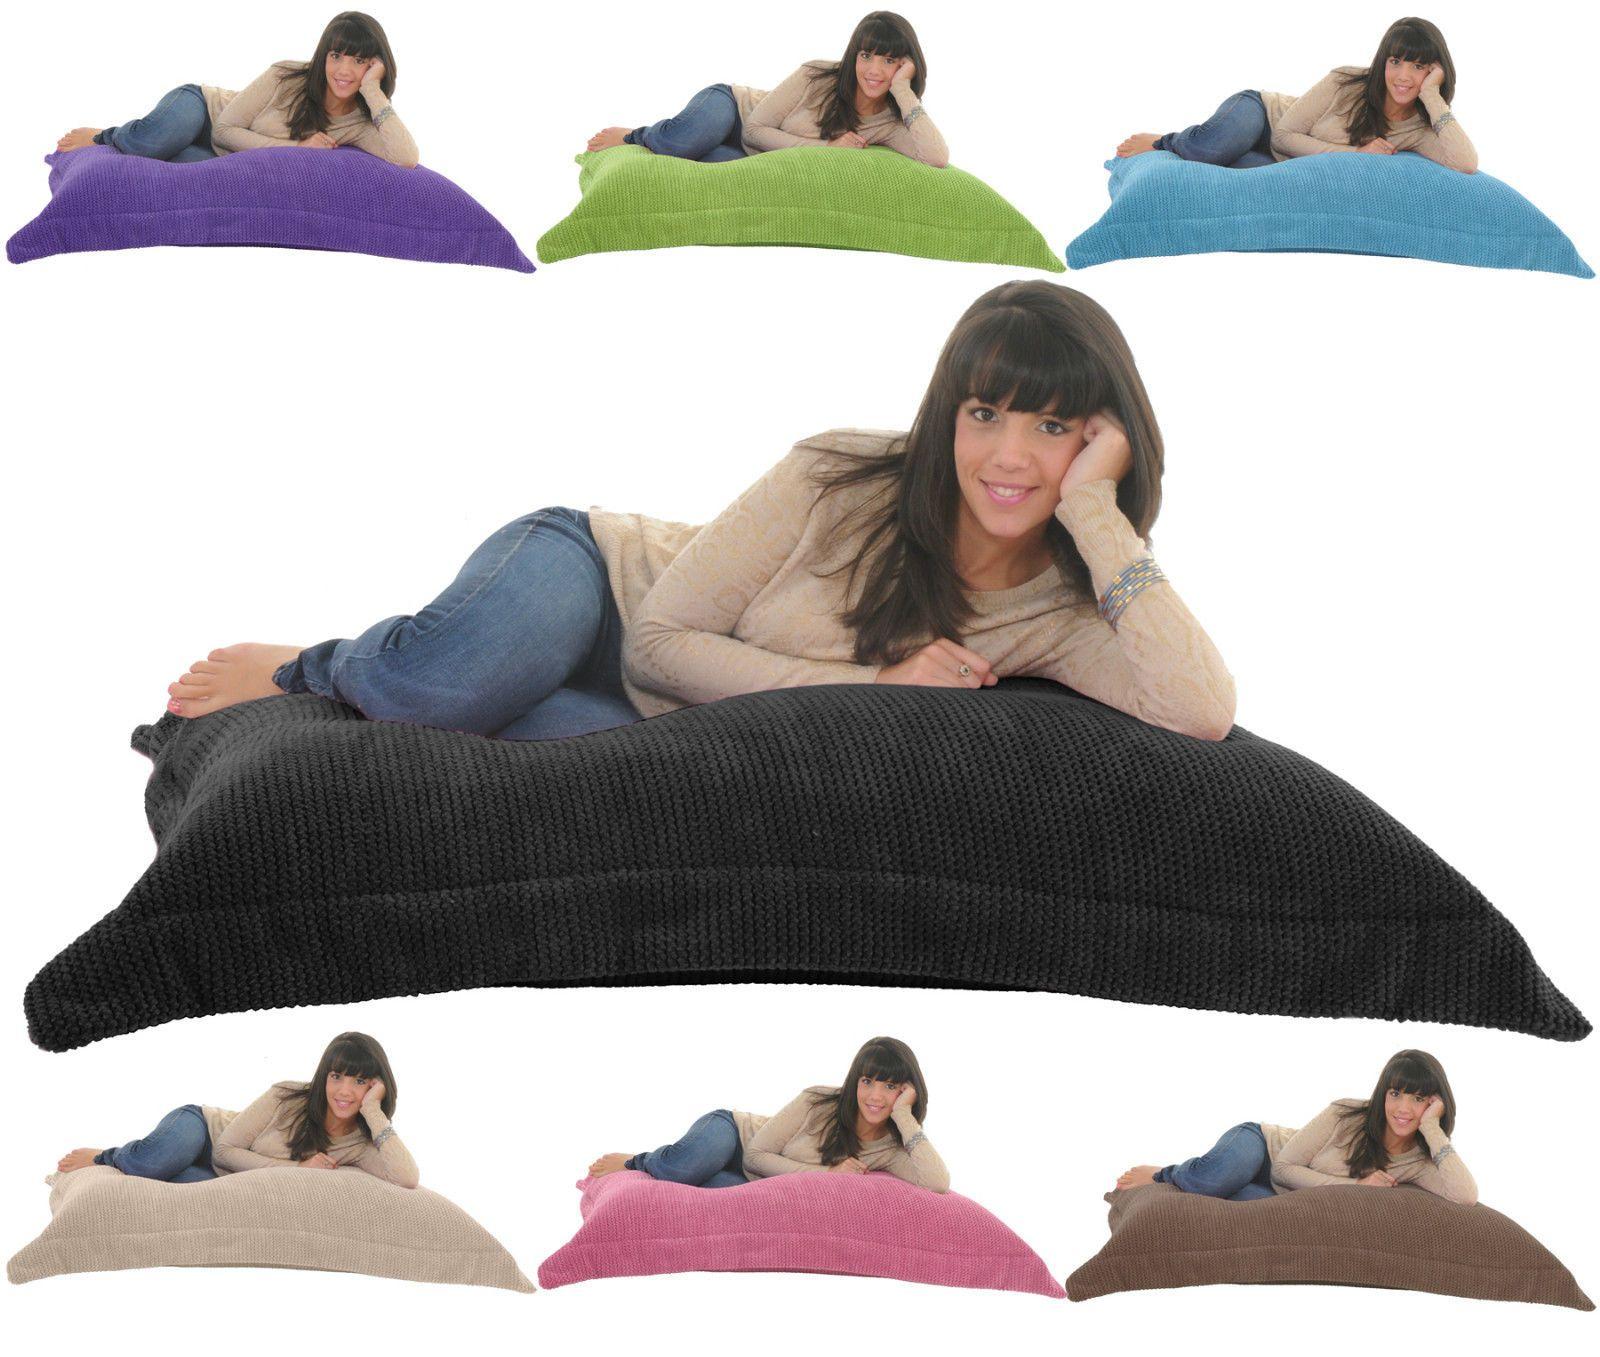 SOFT & SNUGLY CORD Giant Beanbag Floor Cushion Chair Bed Lounger ...